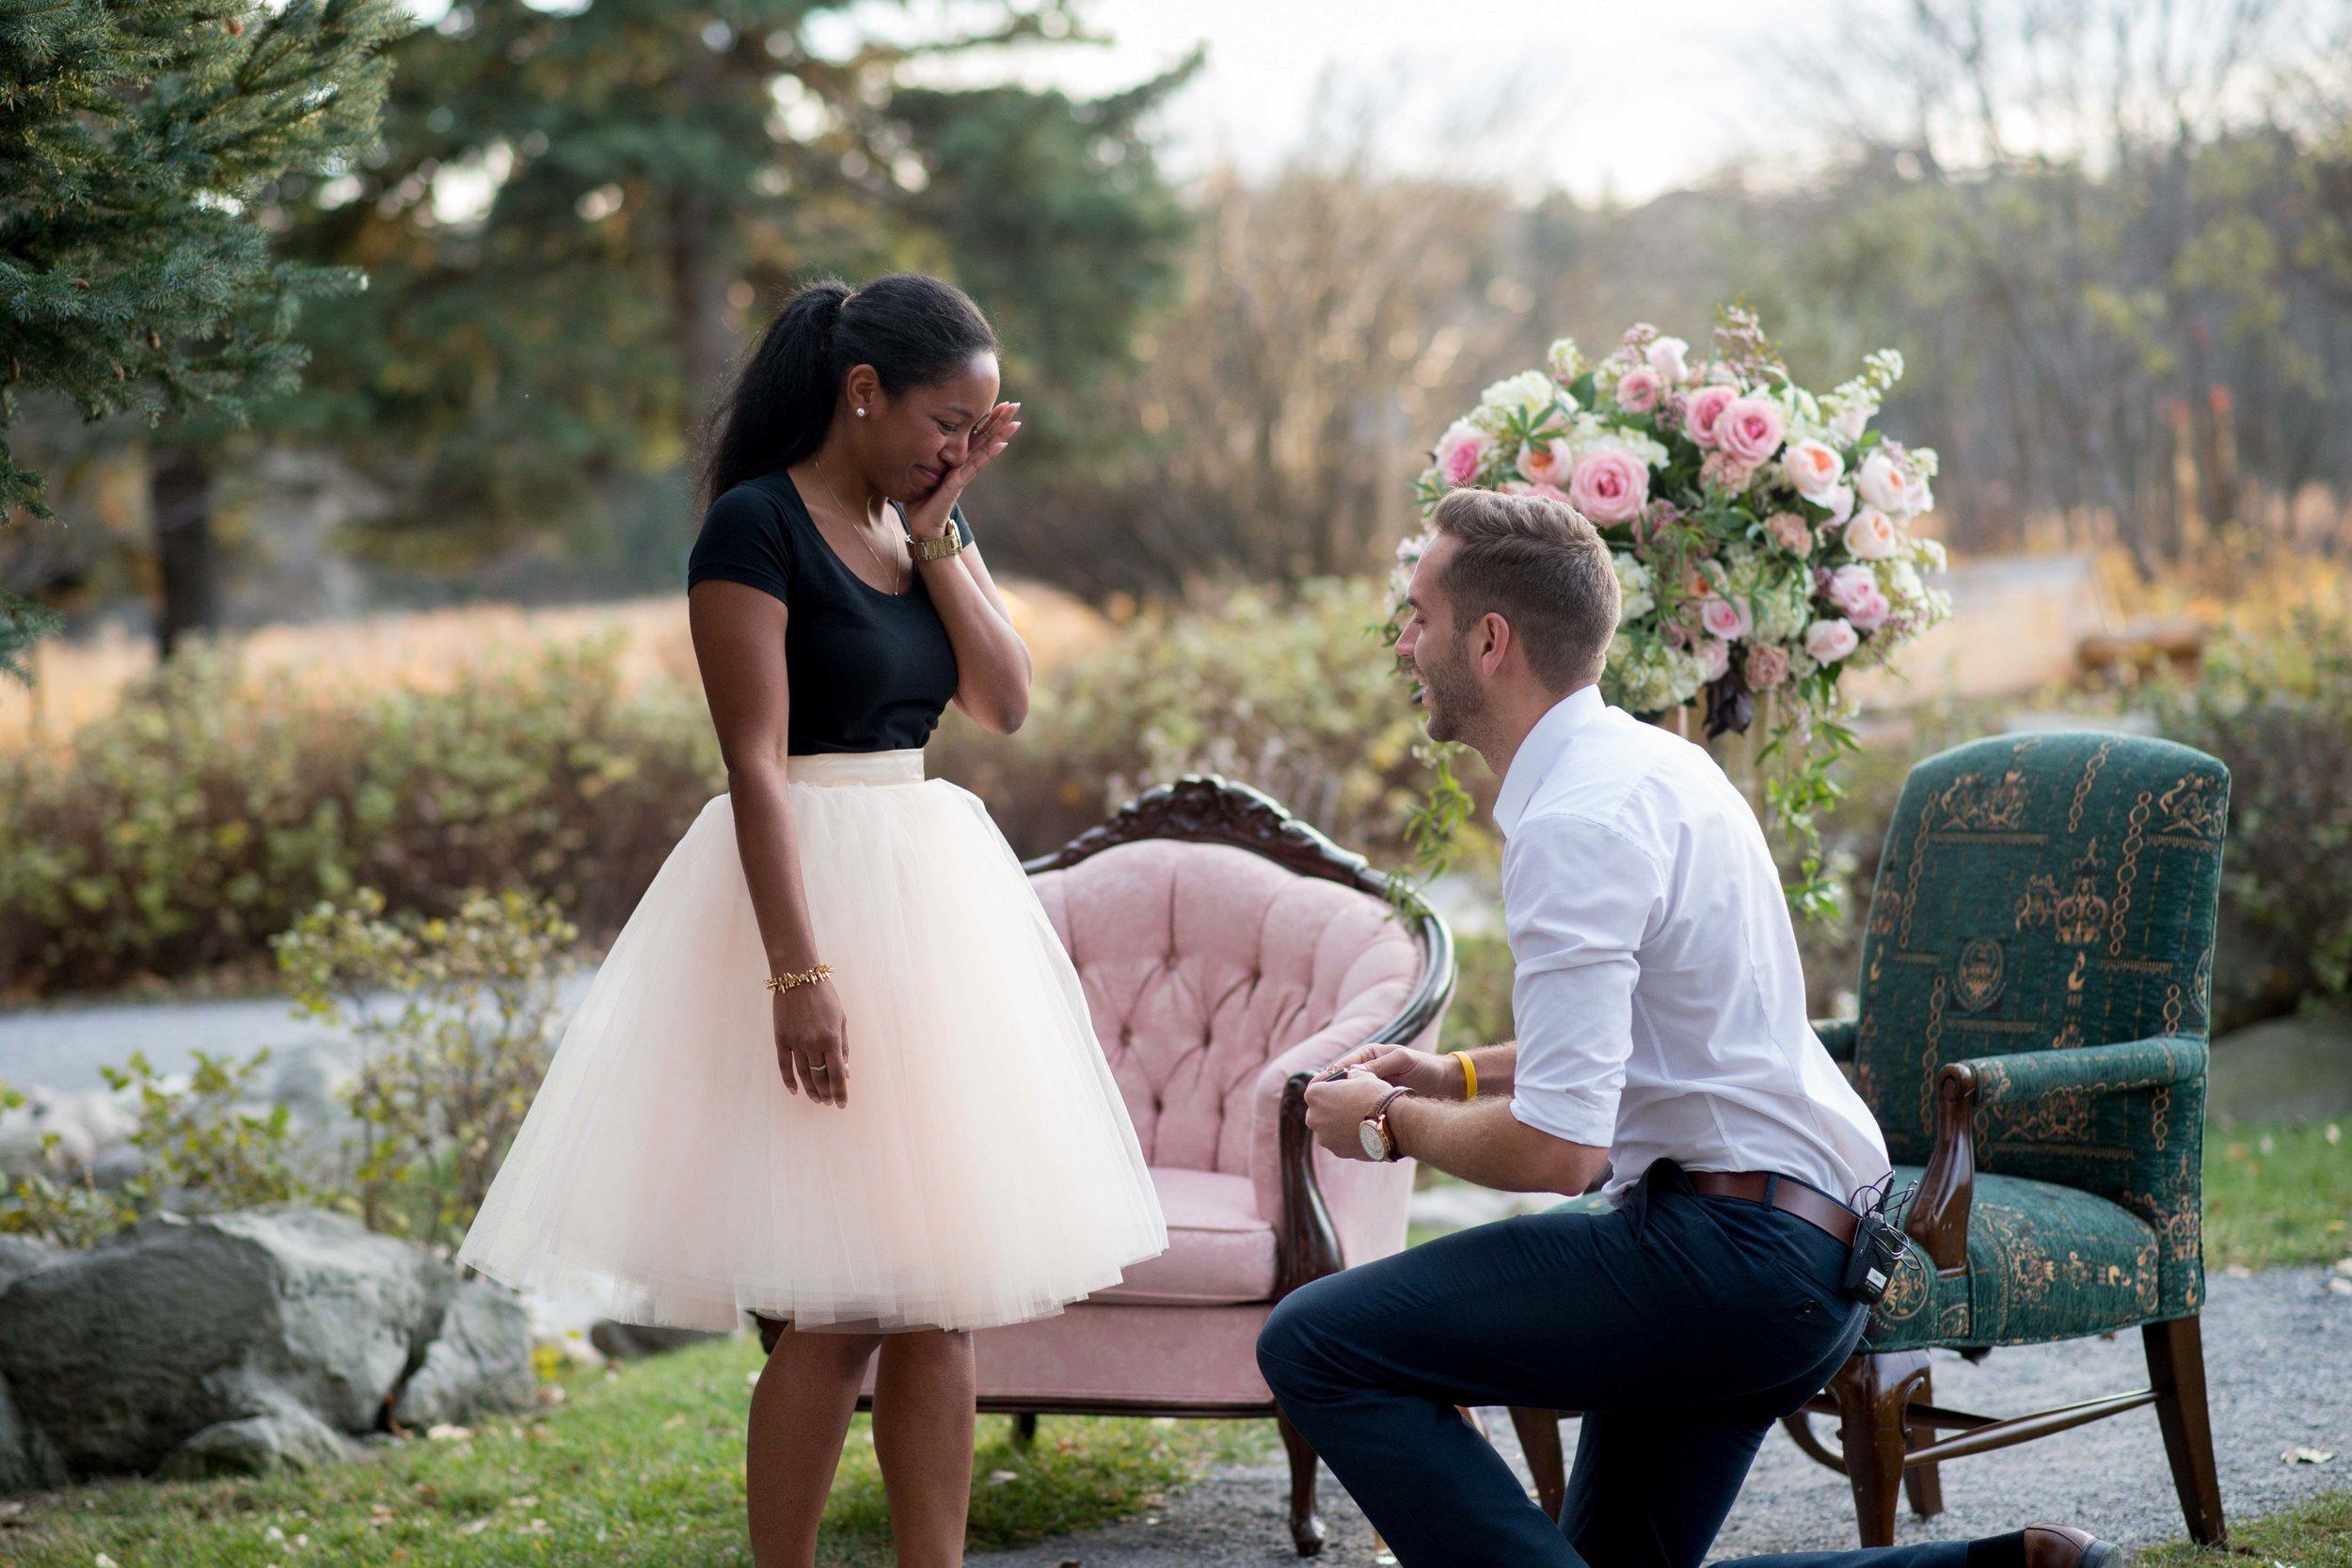 Christy-D-Swanberg-Photography-Calgary-wedding-proposals-02.jpg